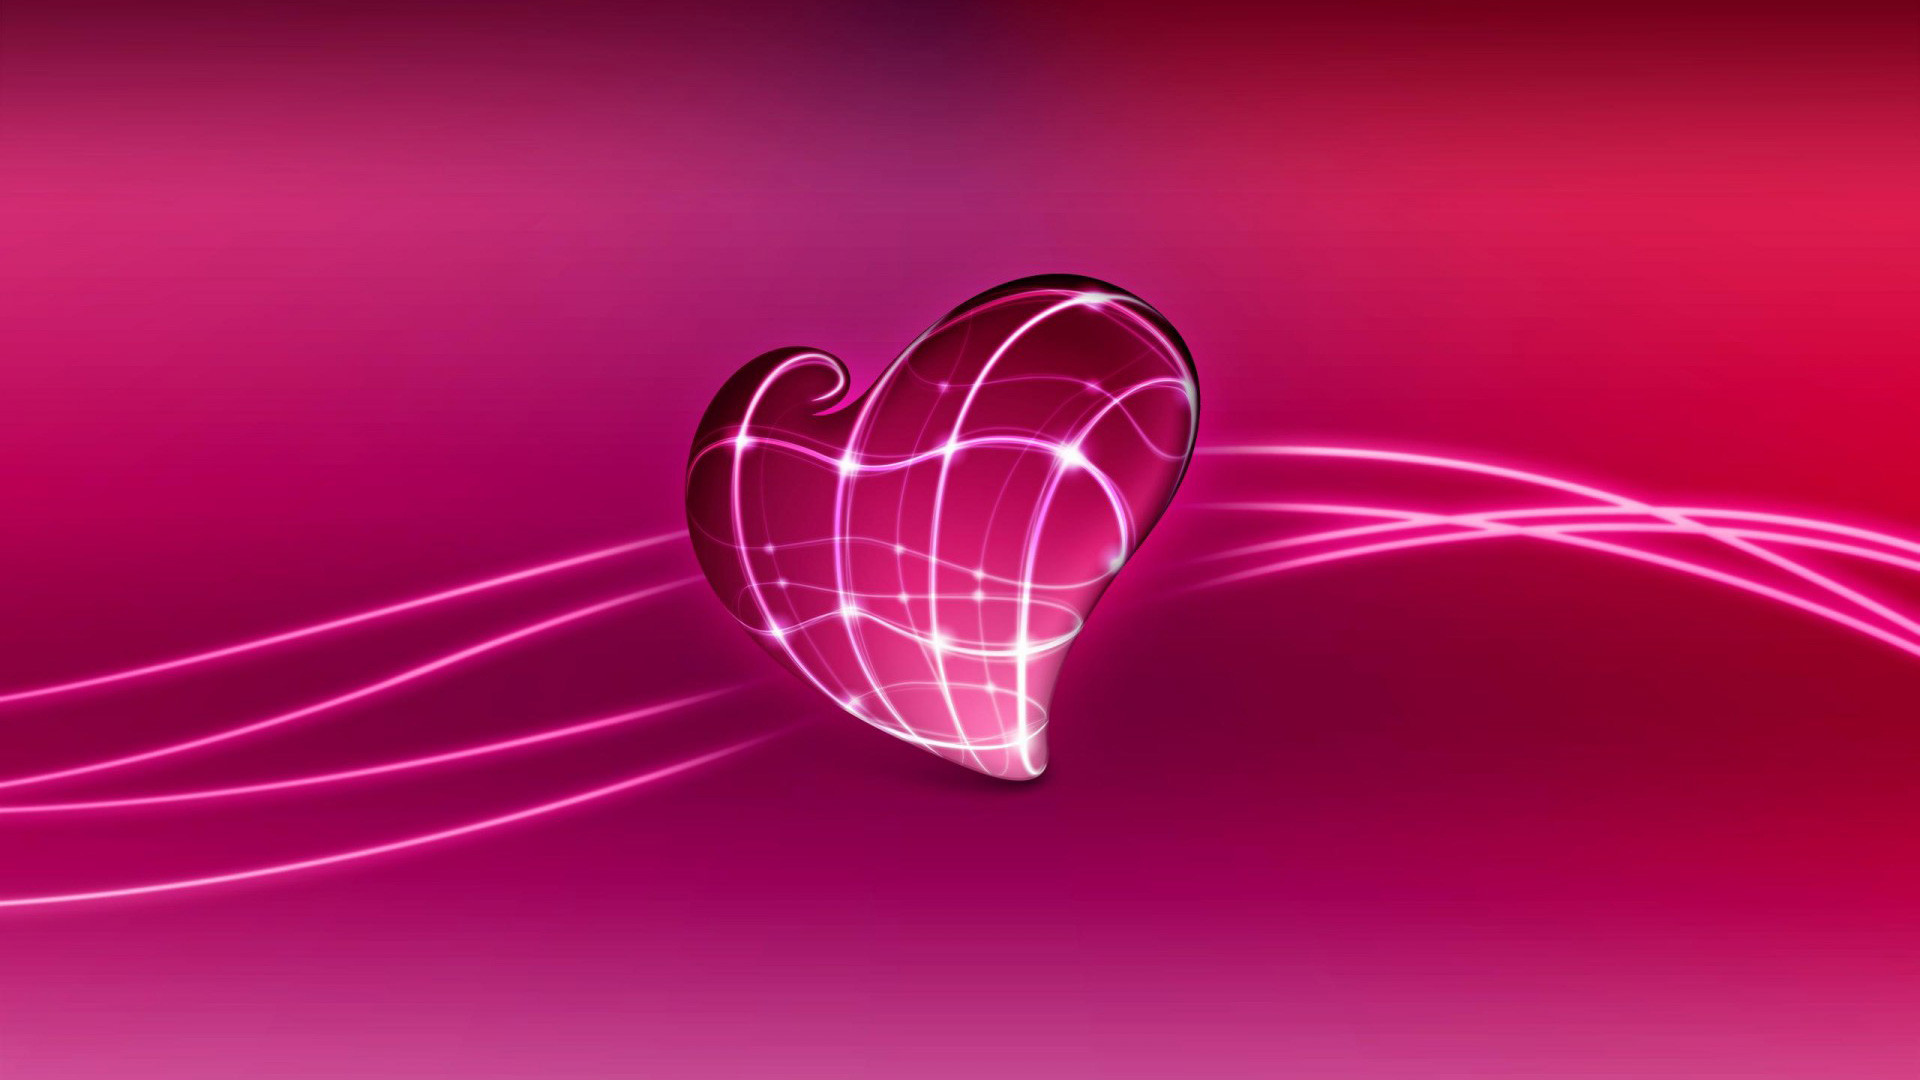 Pink Love Heart – – 16:9